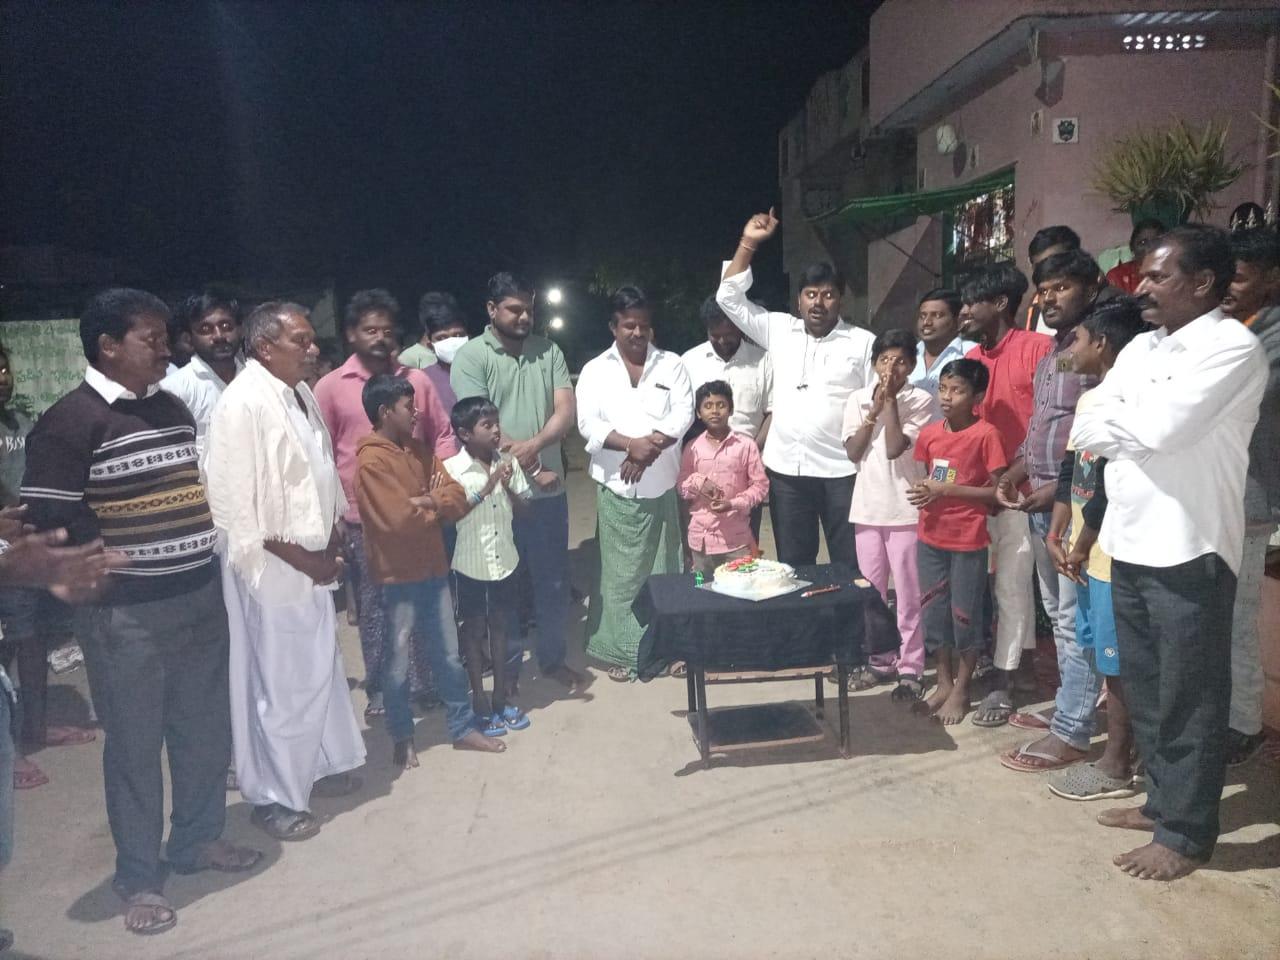 Madula Ramakrishna | Ramakrishna | Rama Krishna | Sarpanch | Unanimous Sarpanch | Active Member | Vice-Chairman of Sri Radha Krishna Rukmini Satyabhama Temple | YSRCP | Ramachandrunipeta | Jaggayyapeta | Krishna | Andhra Pradesh | theLeadersPage